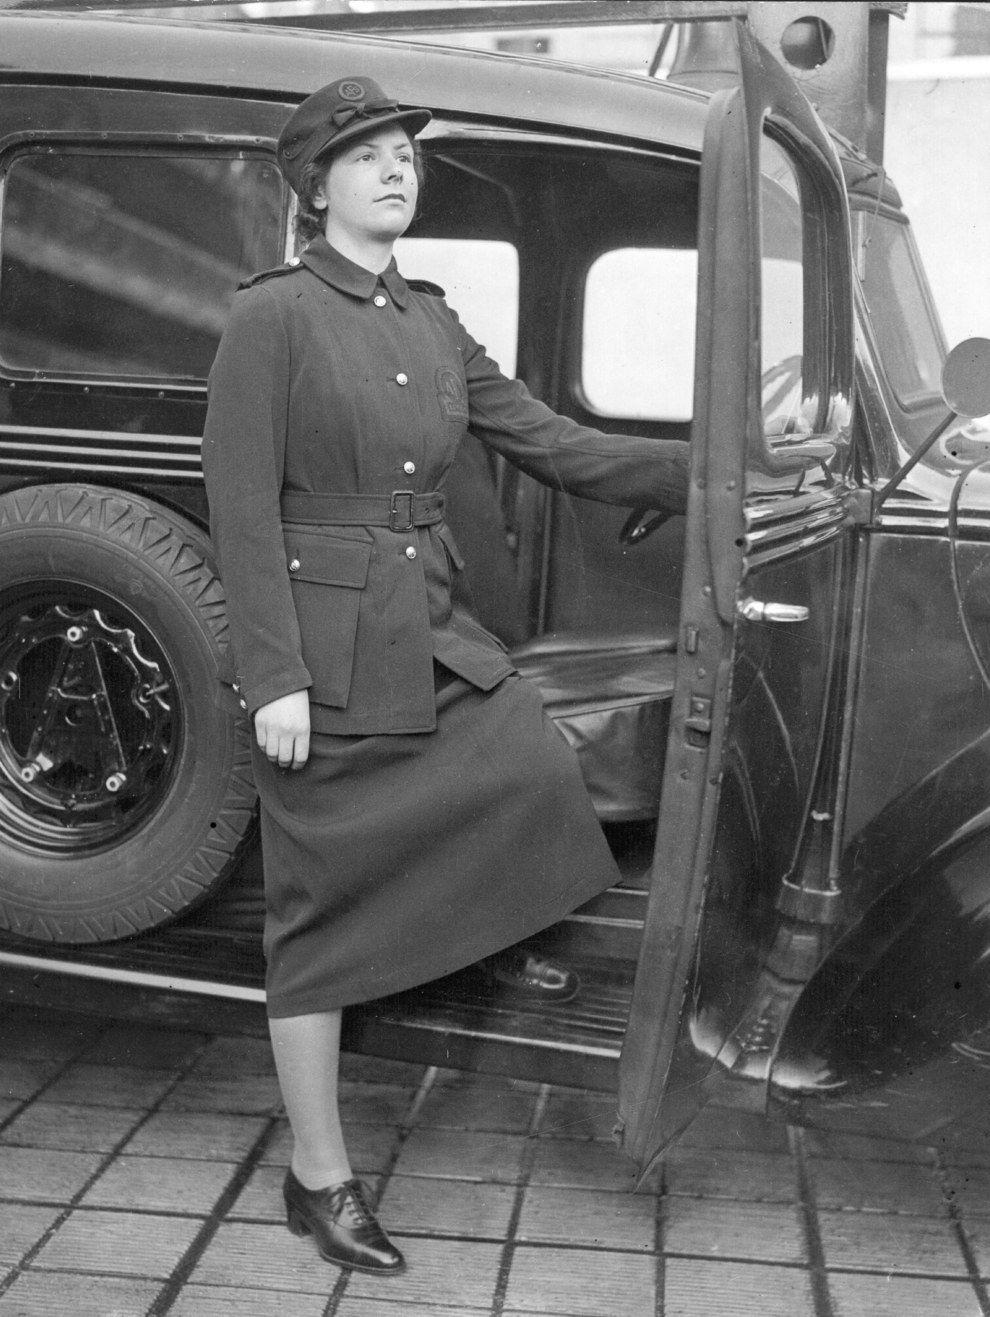 1938 a female firefighter models a new uniform female